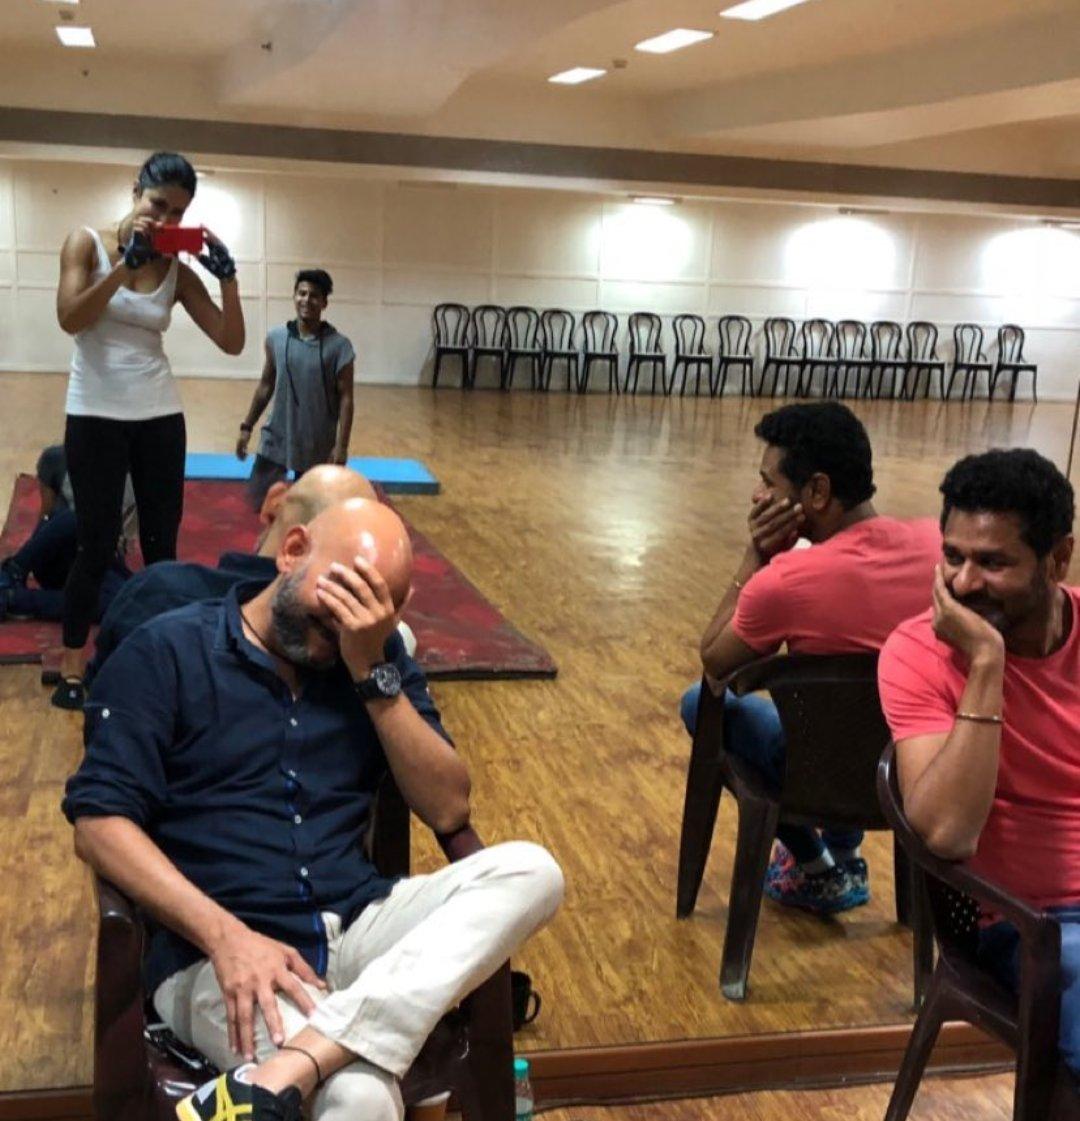 RT @AamirKhanTemple: #KatrinaKaif Victor and @PDdancing at @yrf for #ThugsOfHindostan https://t.co/bAAJxZSB5Z